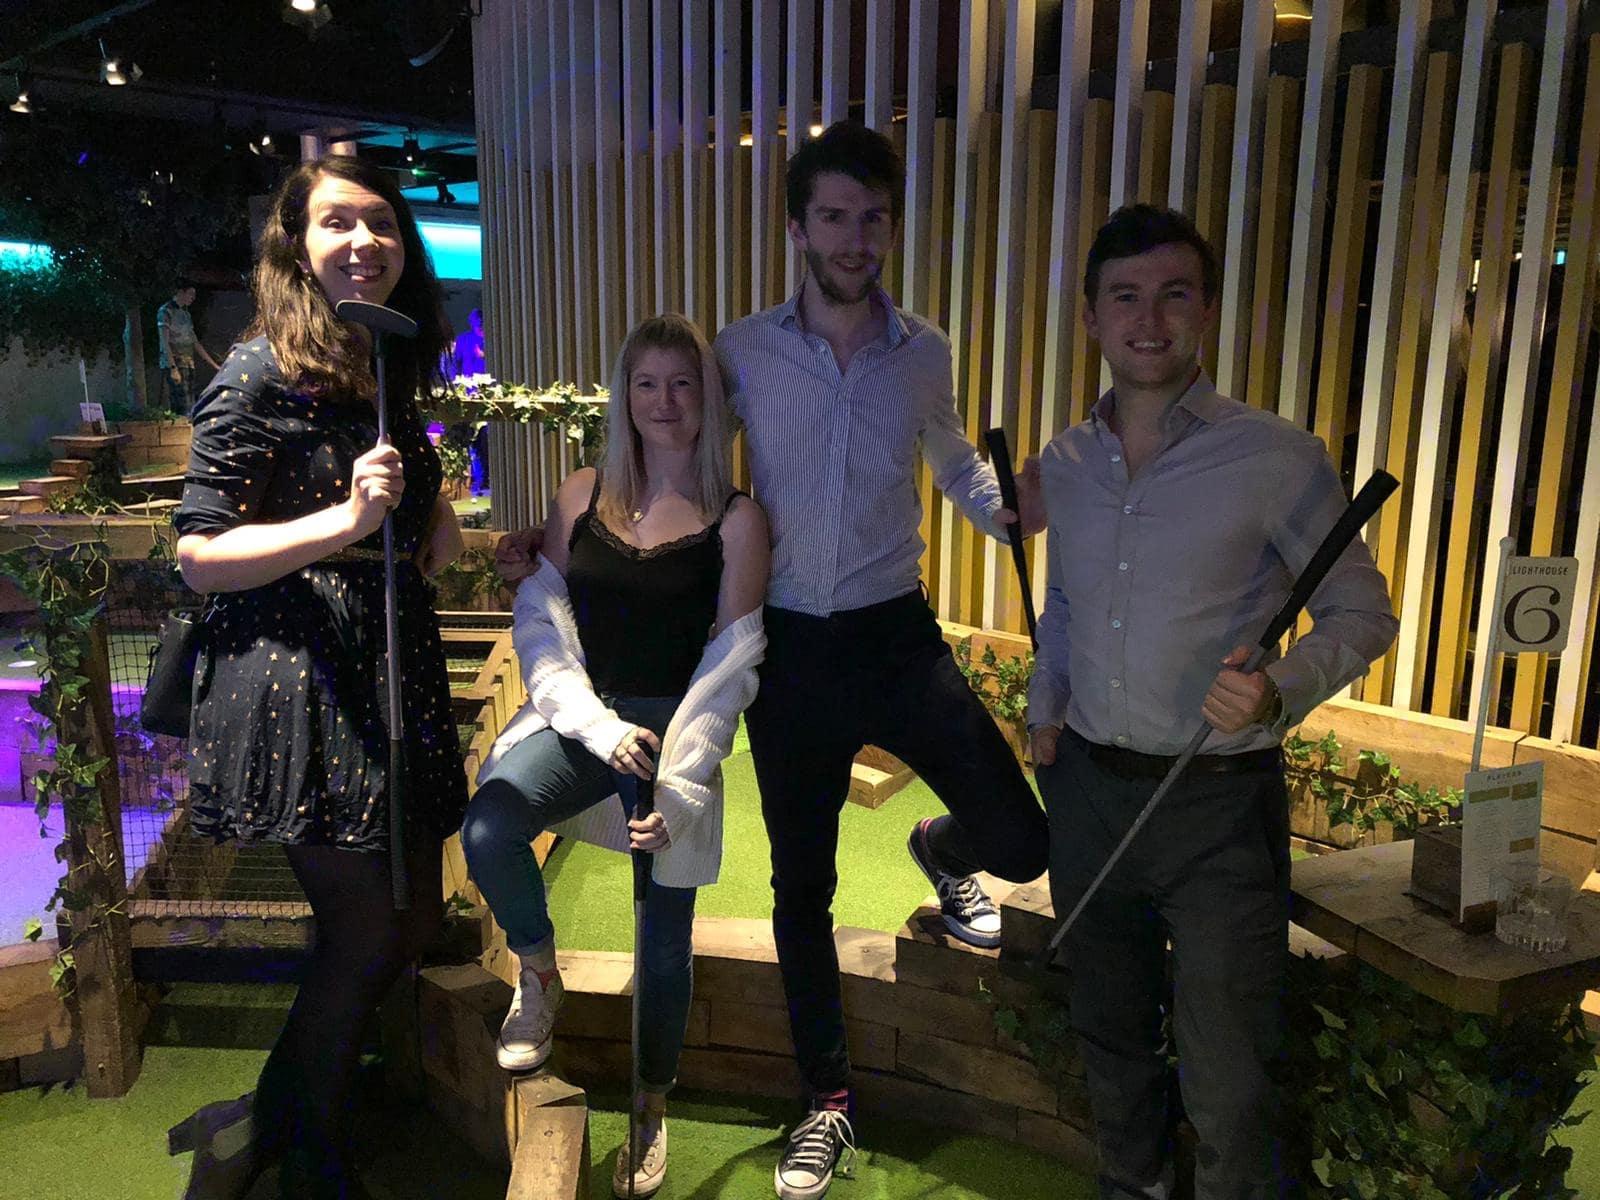 Swingers Golf – The City